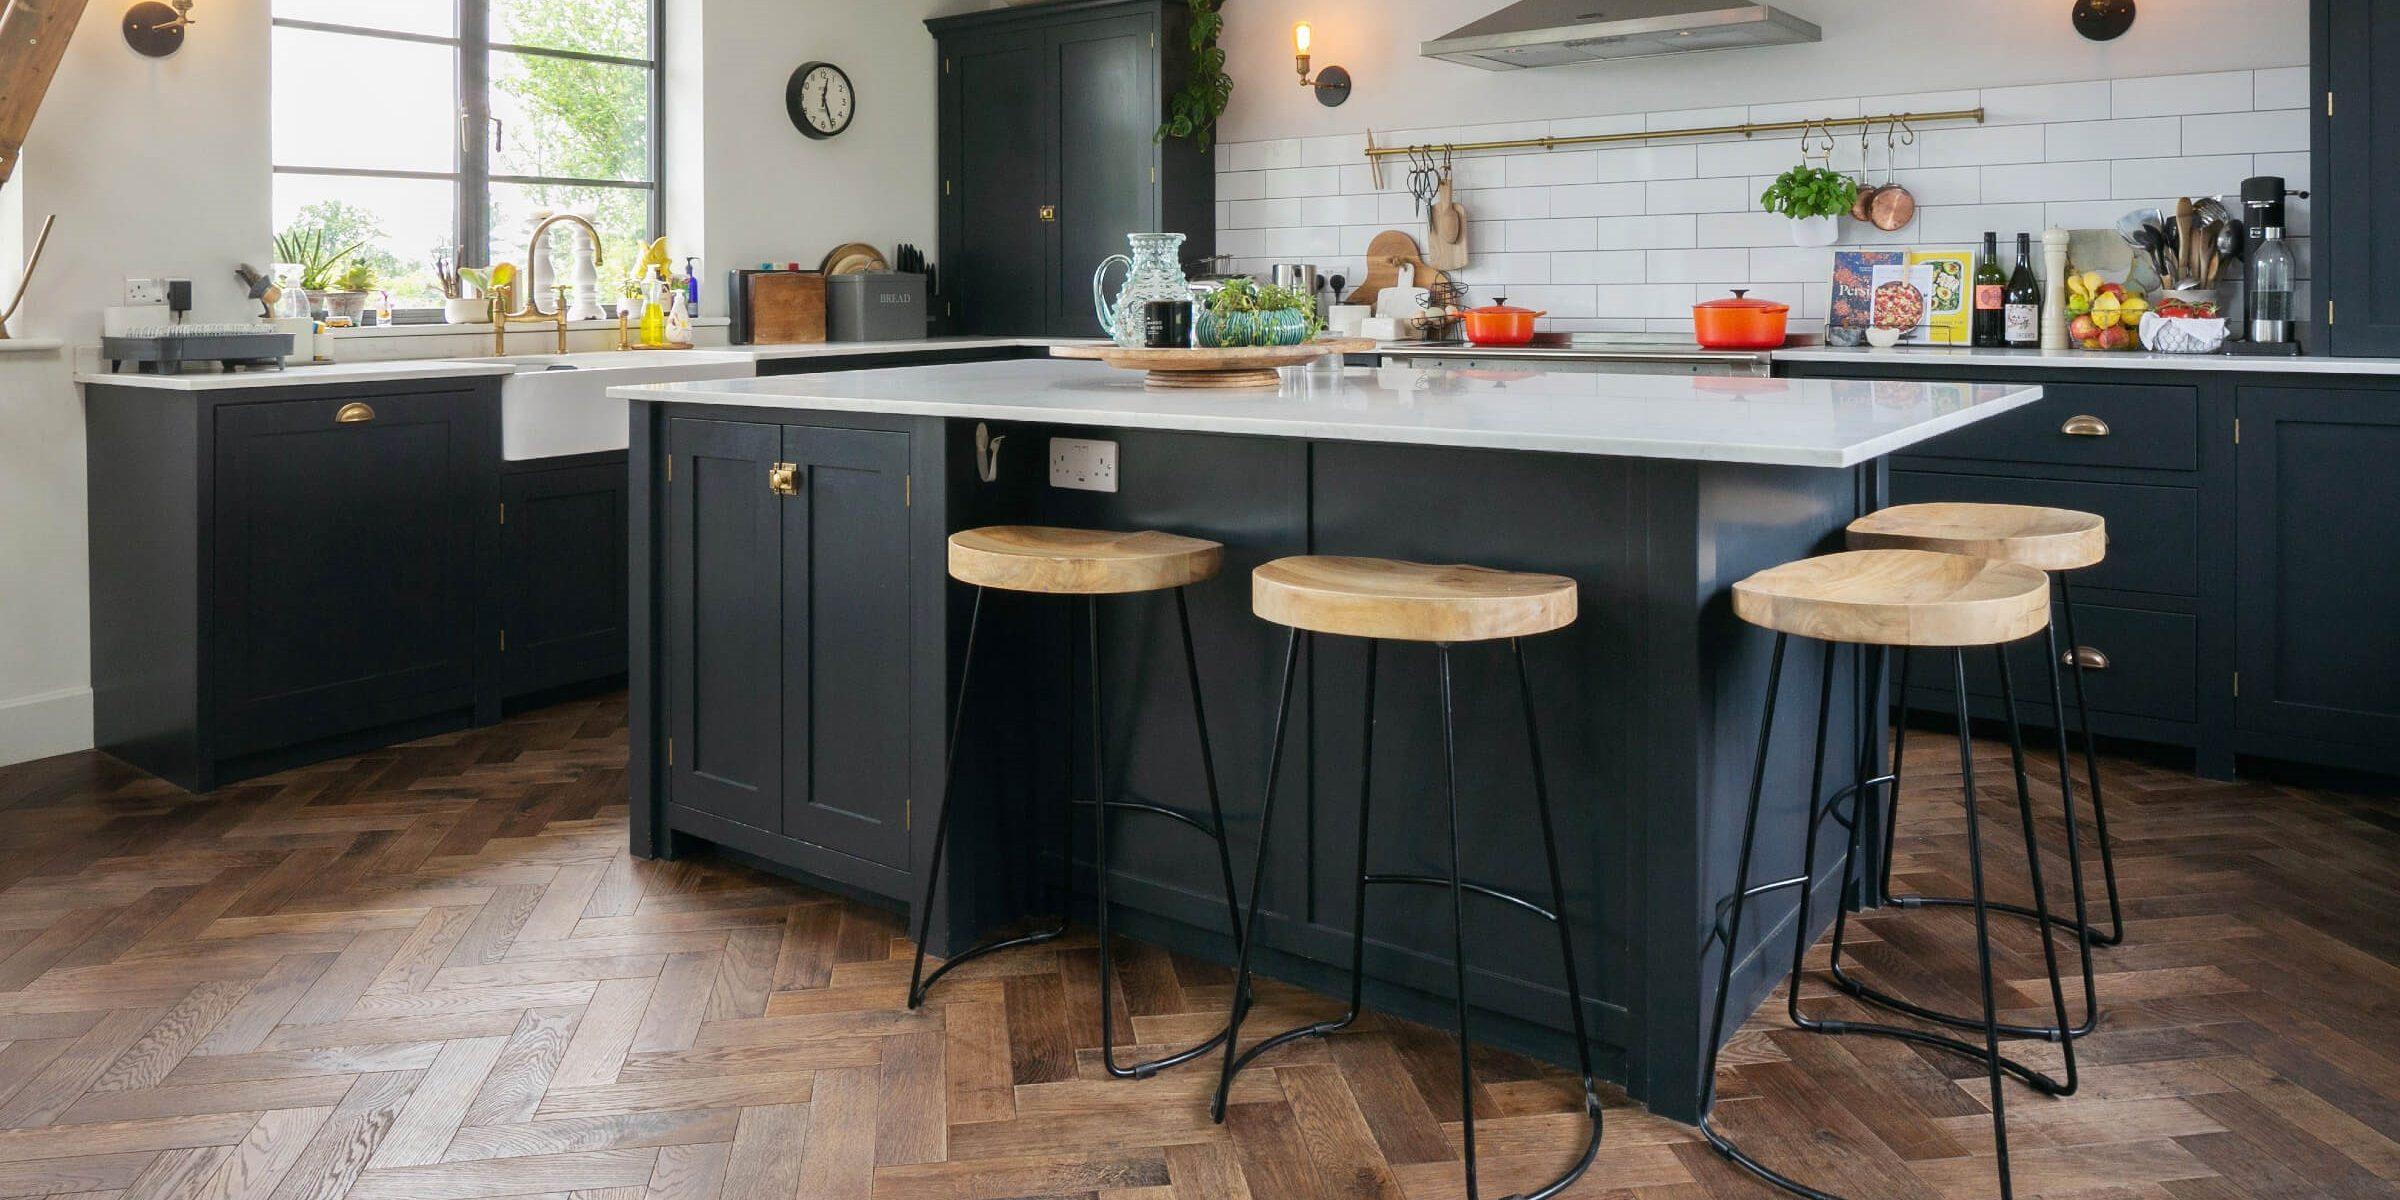 devol kitchen with herringbone floors